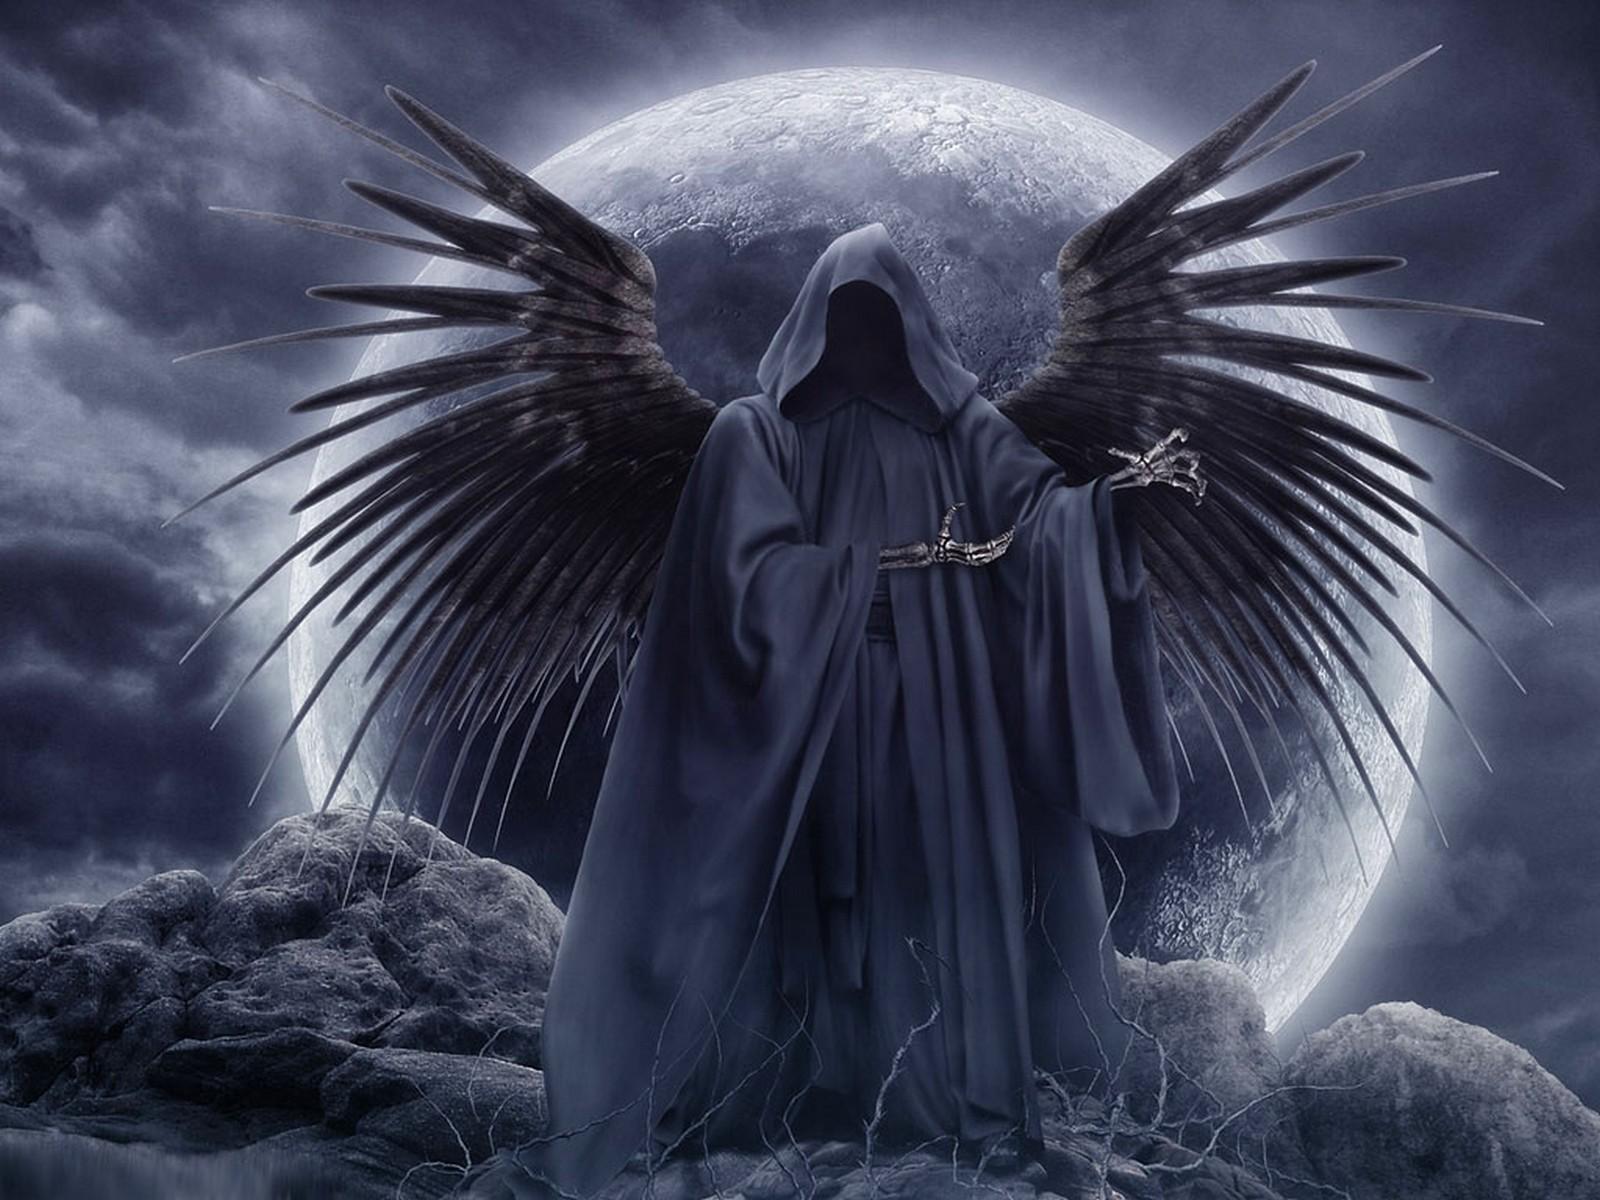 http://1.bp.blogspot.com/--HJGntSGFk4/T0LdHeNQO1I/AAAAAAAAAKk/xWwSTHsU1iM/s1600/grim-reaper-grim-reaper-1600x1200.jpg